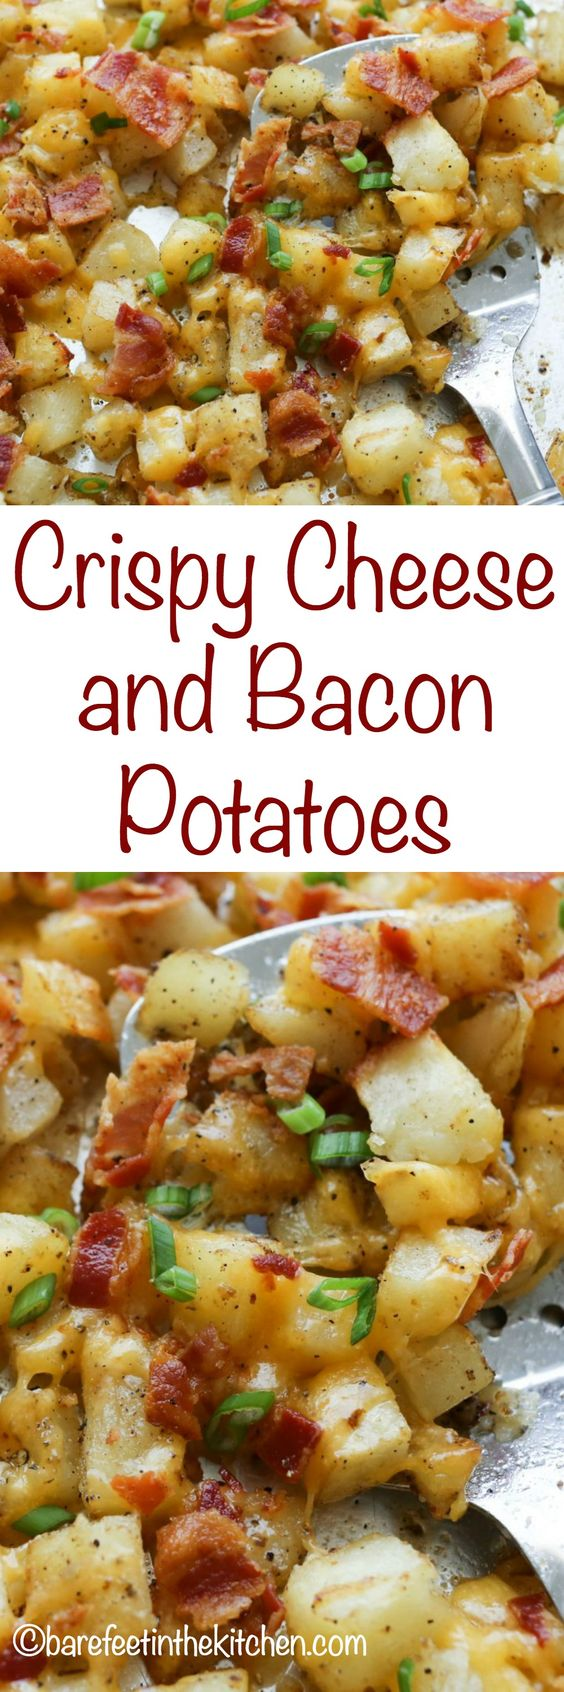 Crispy Cheese and Bacon Potatoes Crispy Cheese and Bacon Potatoes